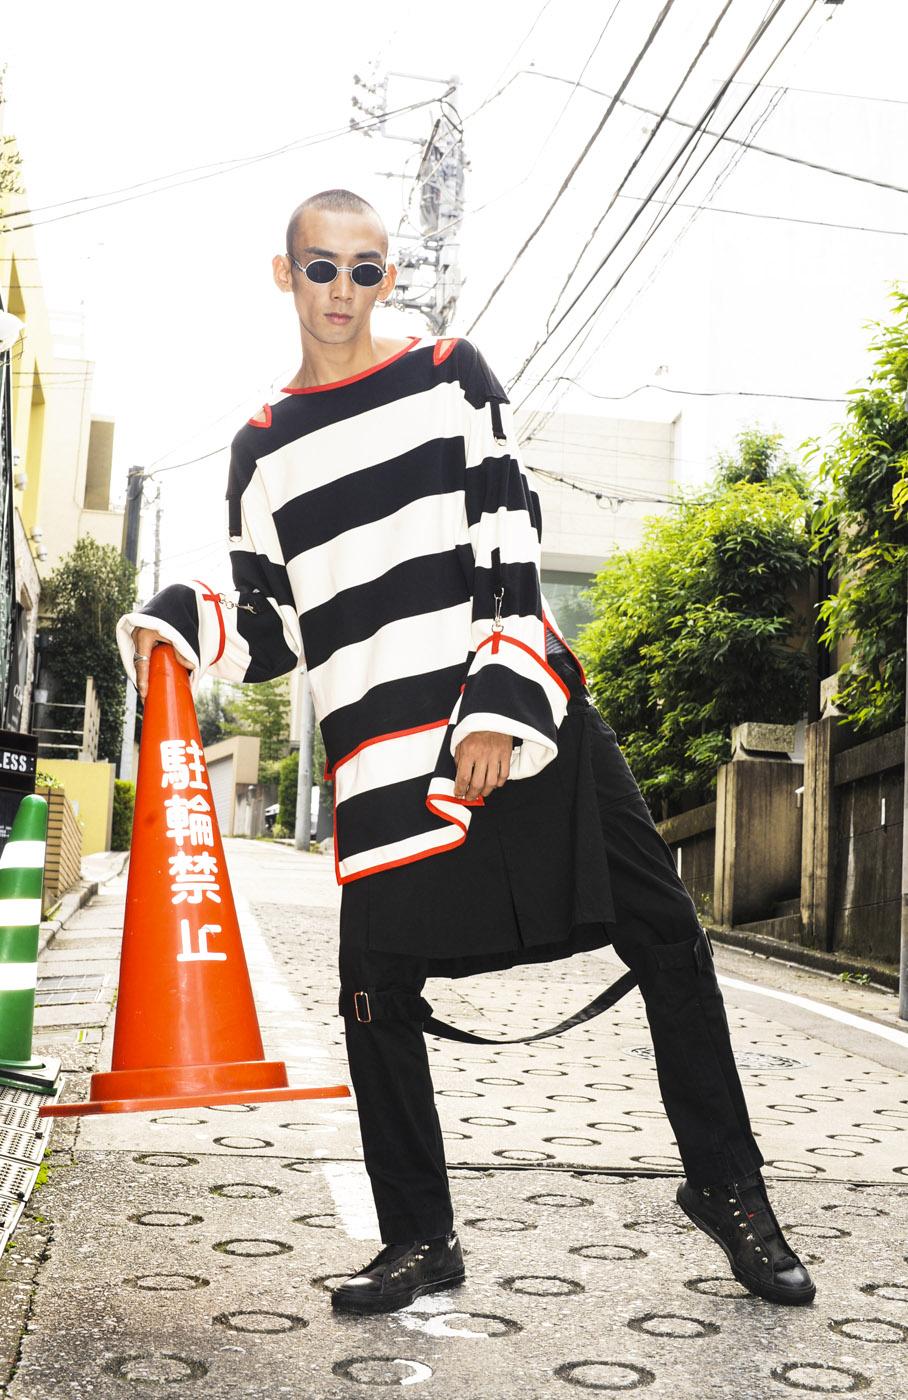 nincompoop-capacityx-kyohei-by-rumi-matsuzawa-for-chasseur-magazine-3